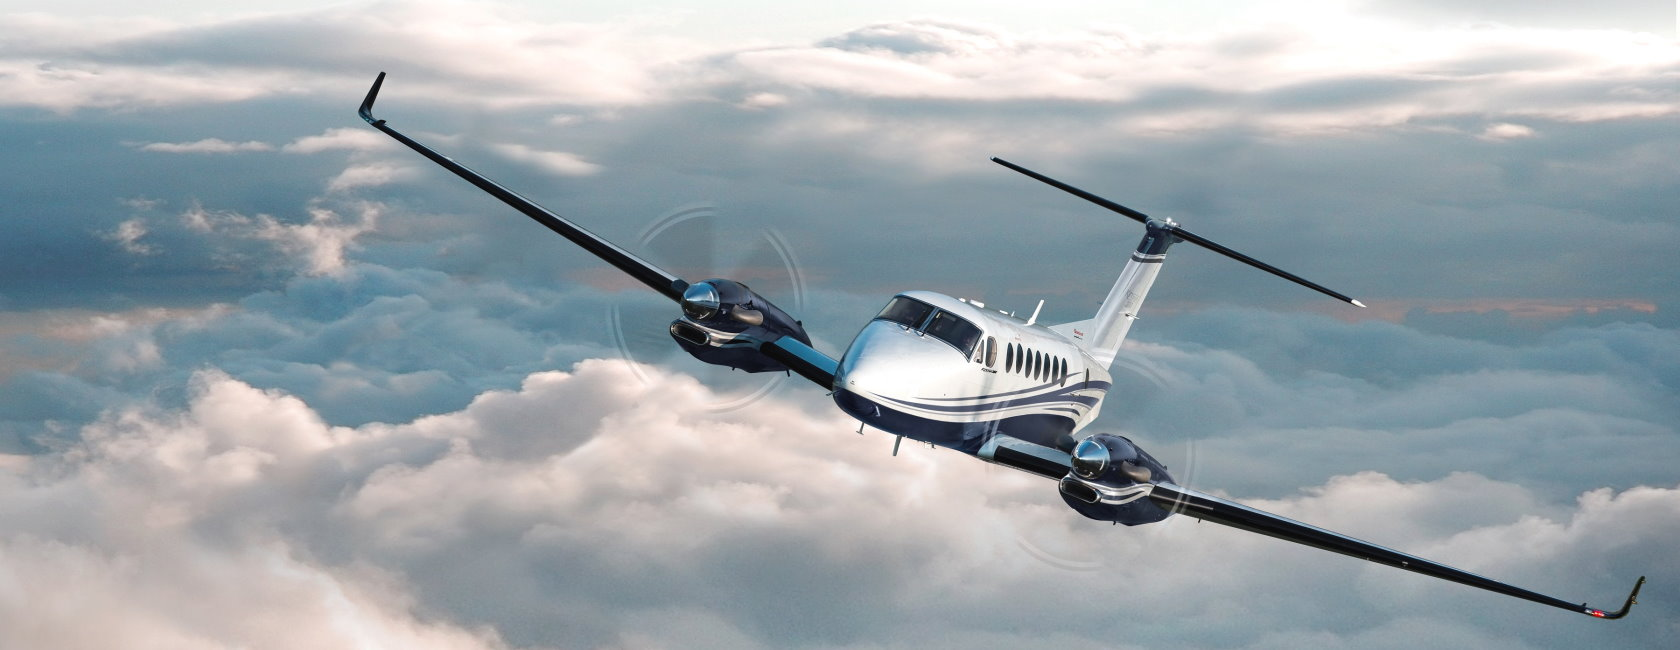 Introducing the Beechcraft King Air 360